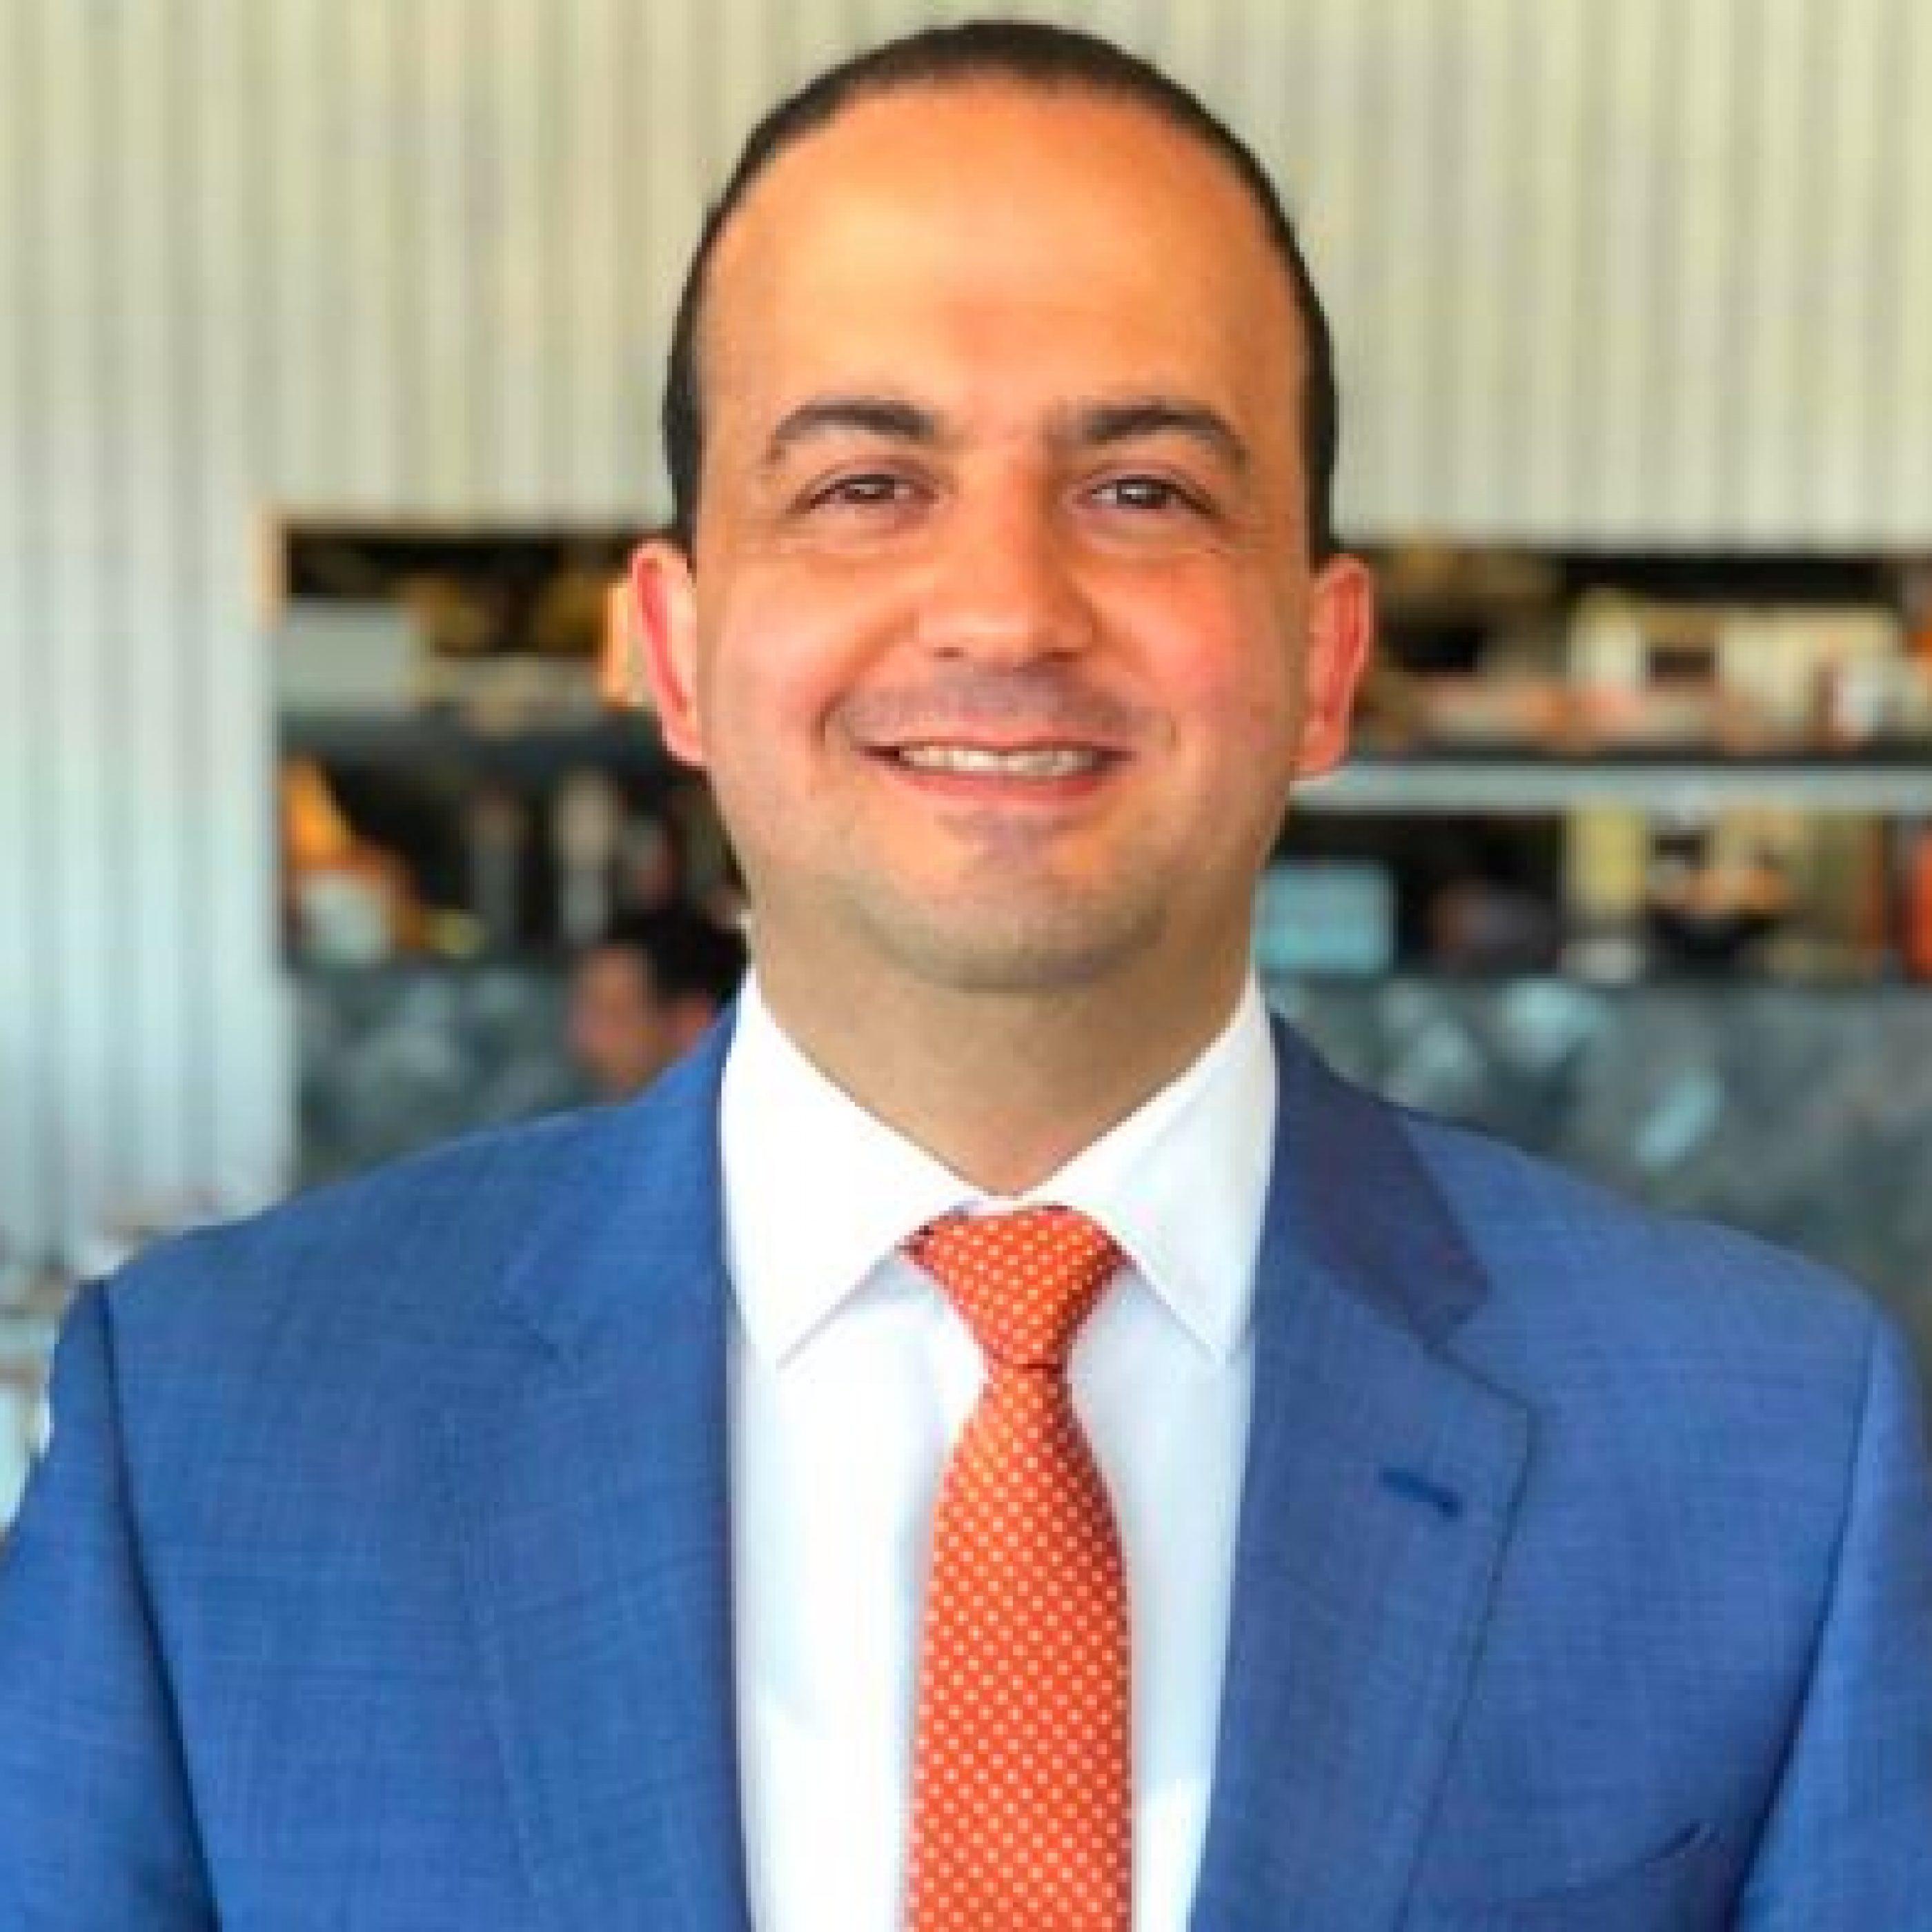 Sidney Minassian Entrepreneur, Speaker and Coach